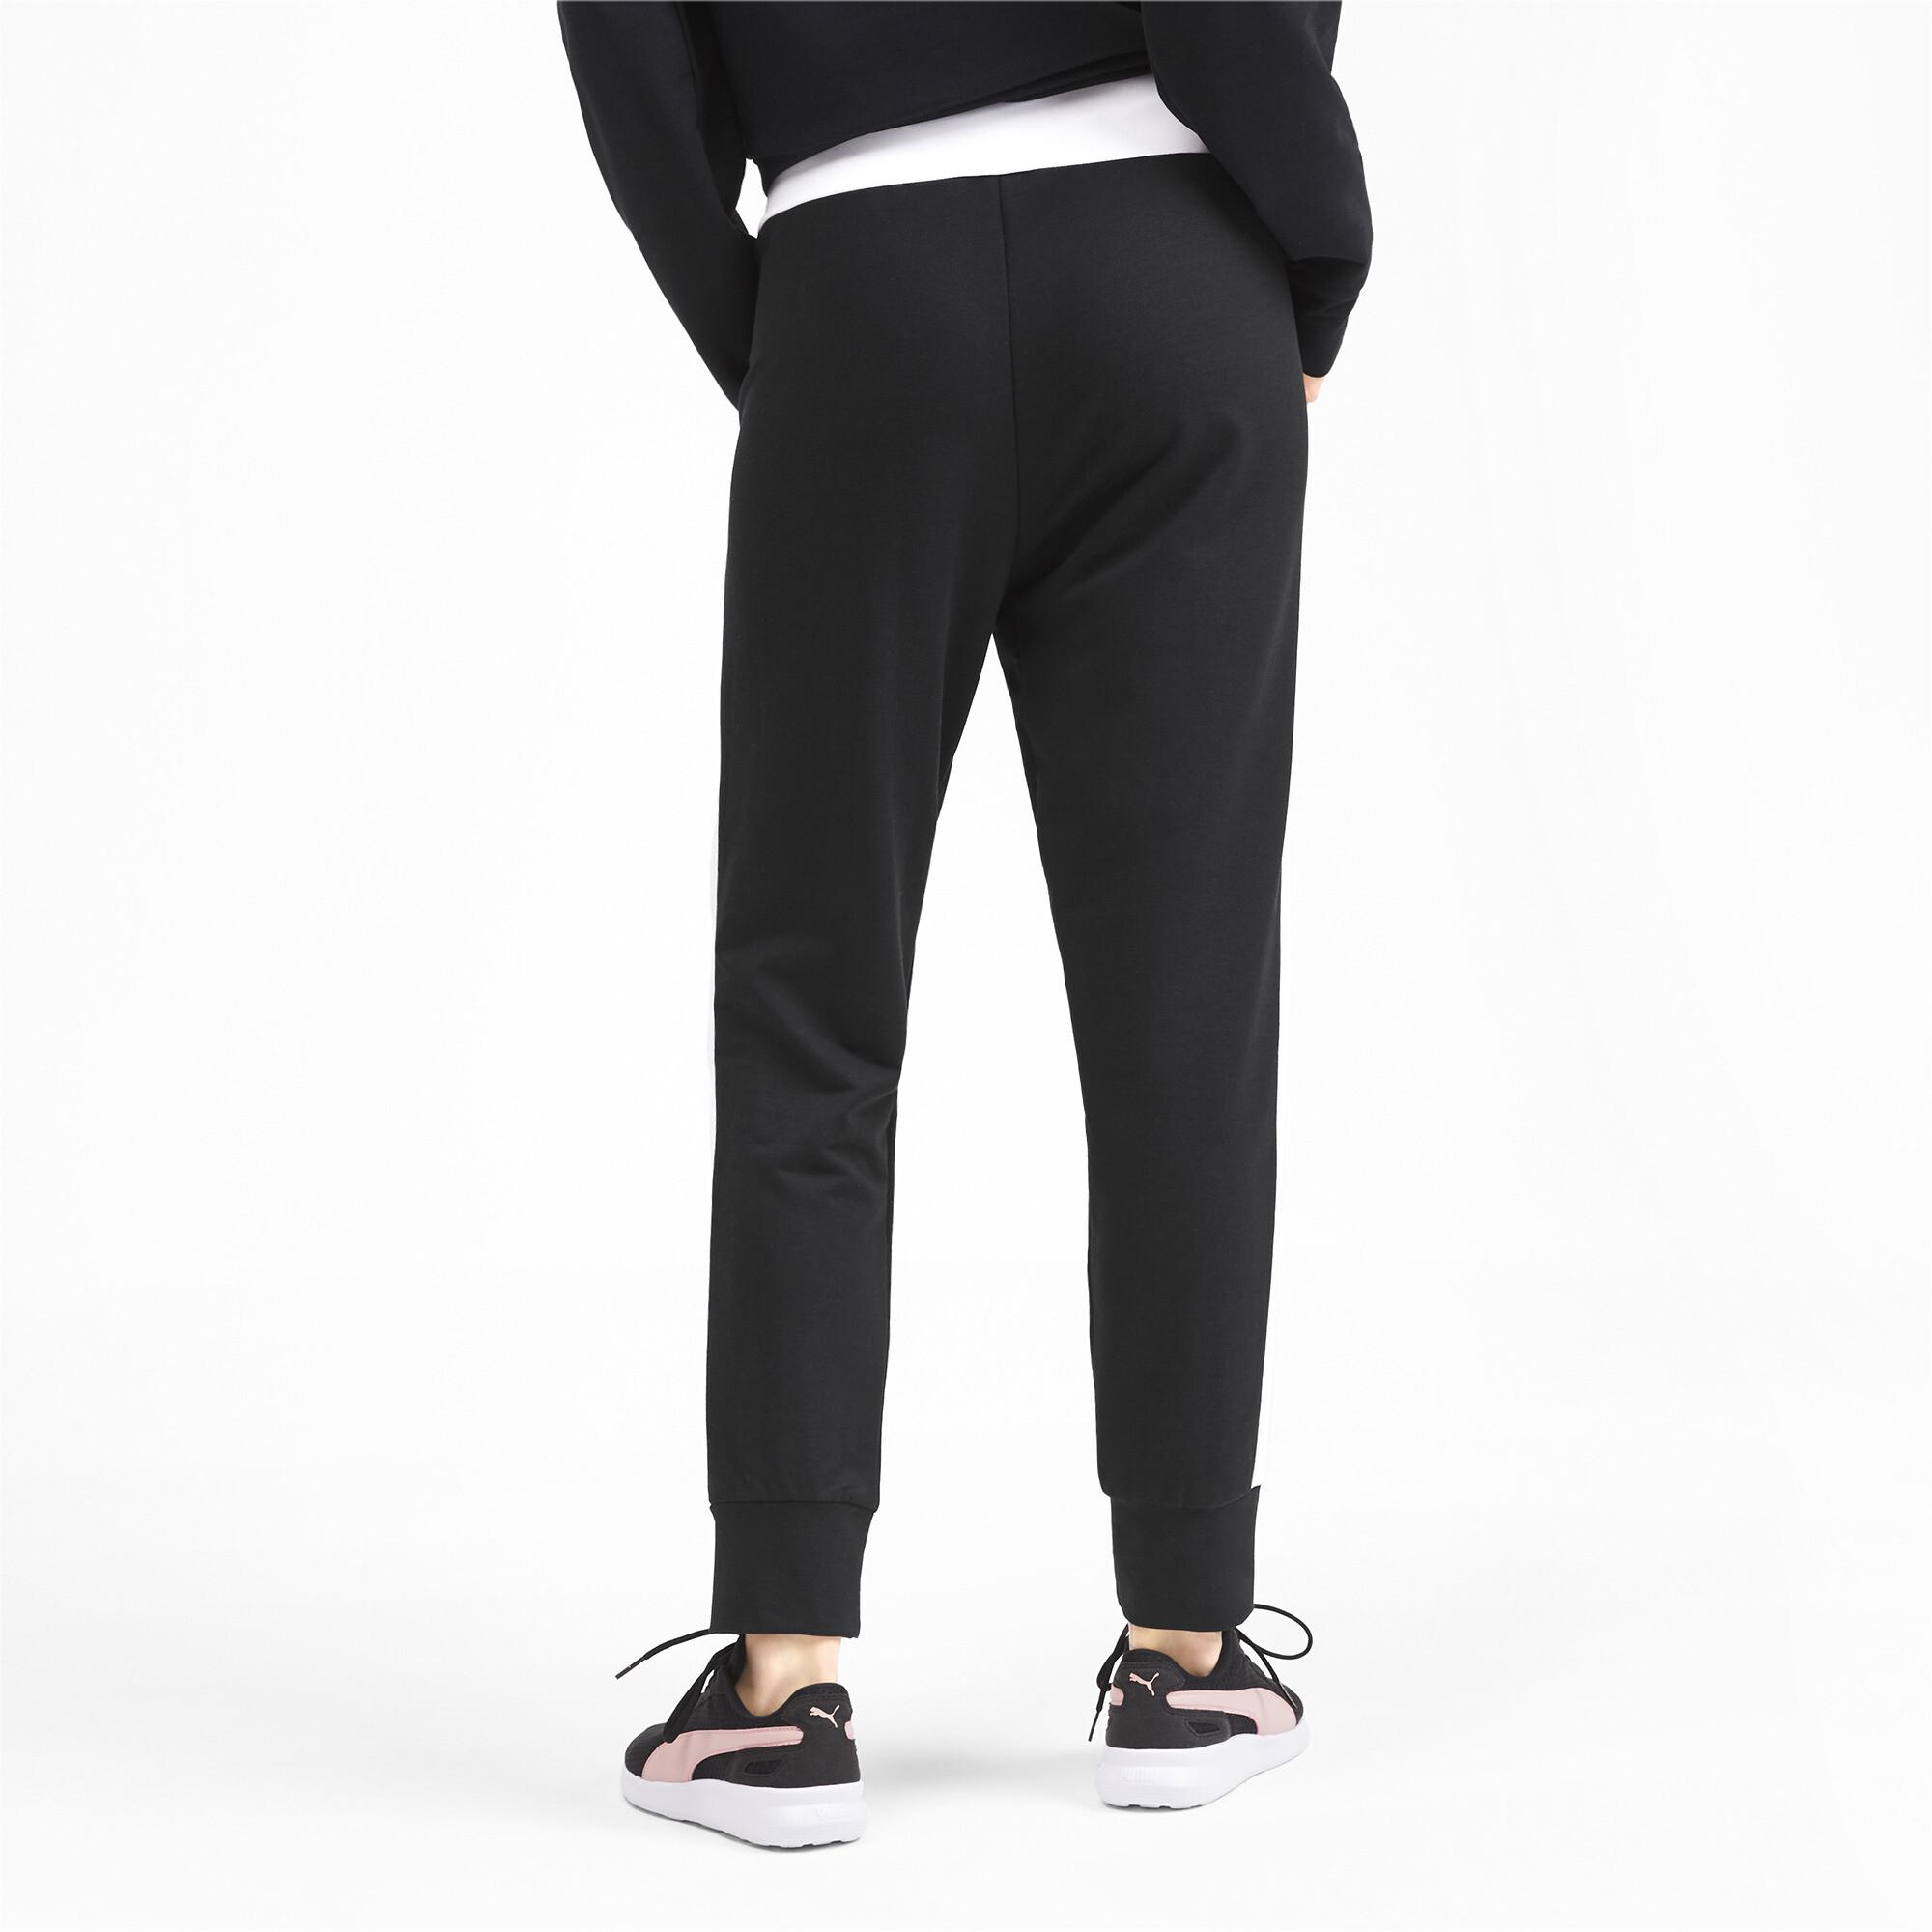 PUMA-Modern-Sports-Women-039-s-Track-Pants-Women-Knitted-Pants-Basics thumbnail 15